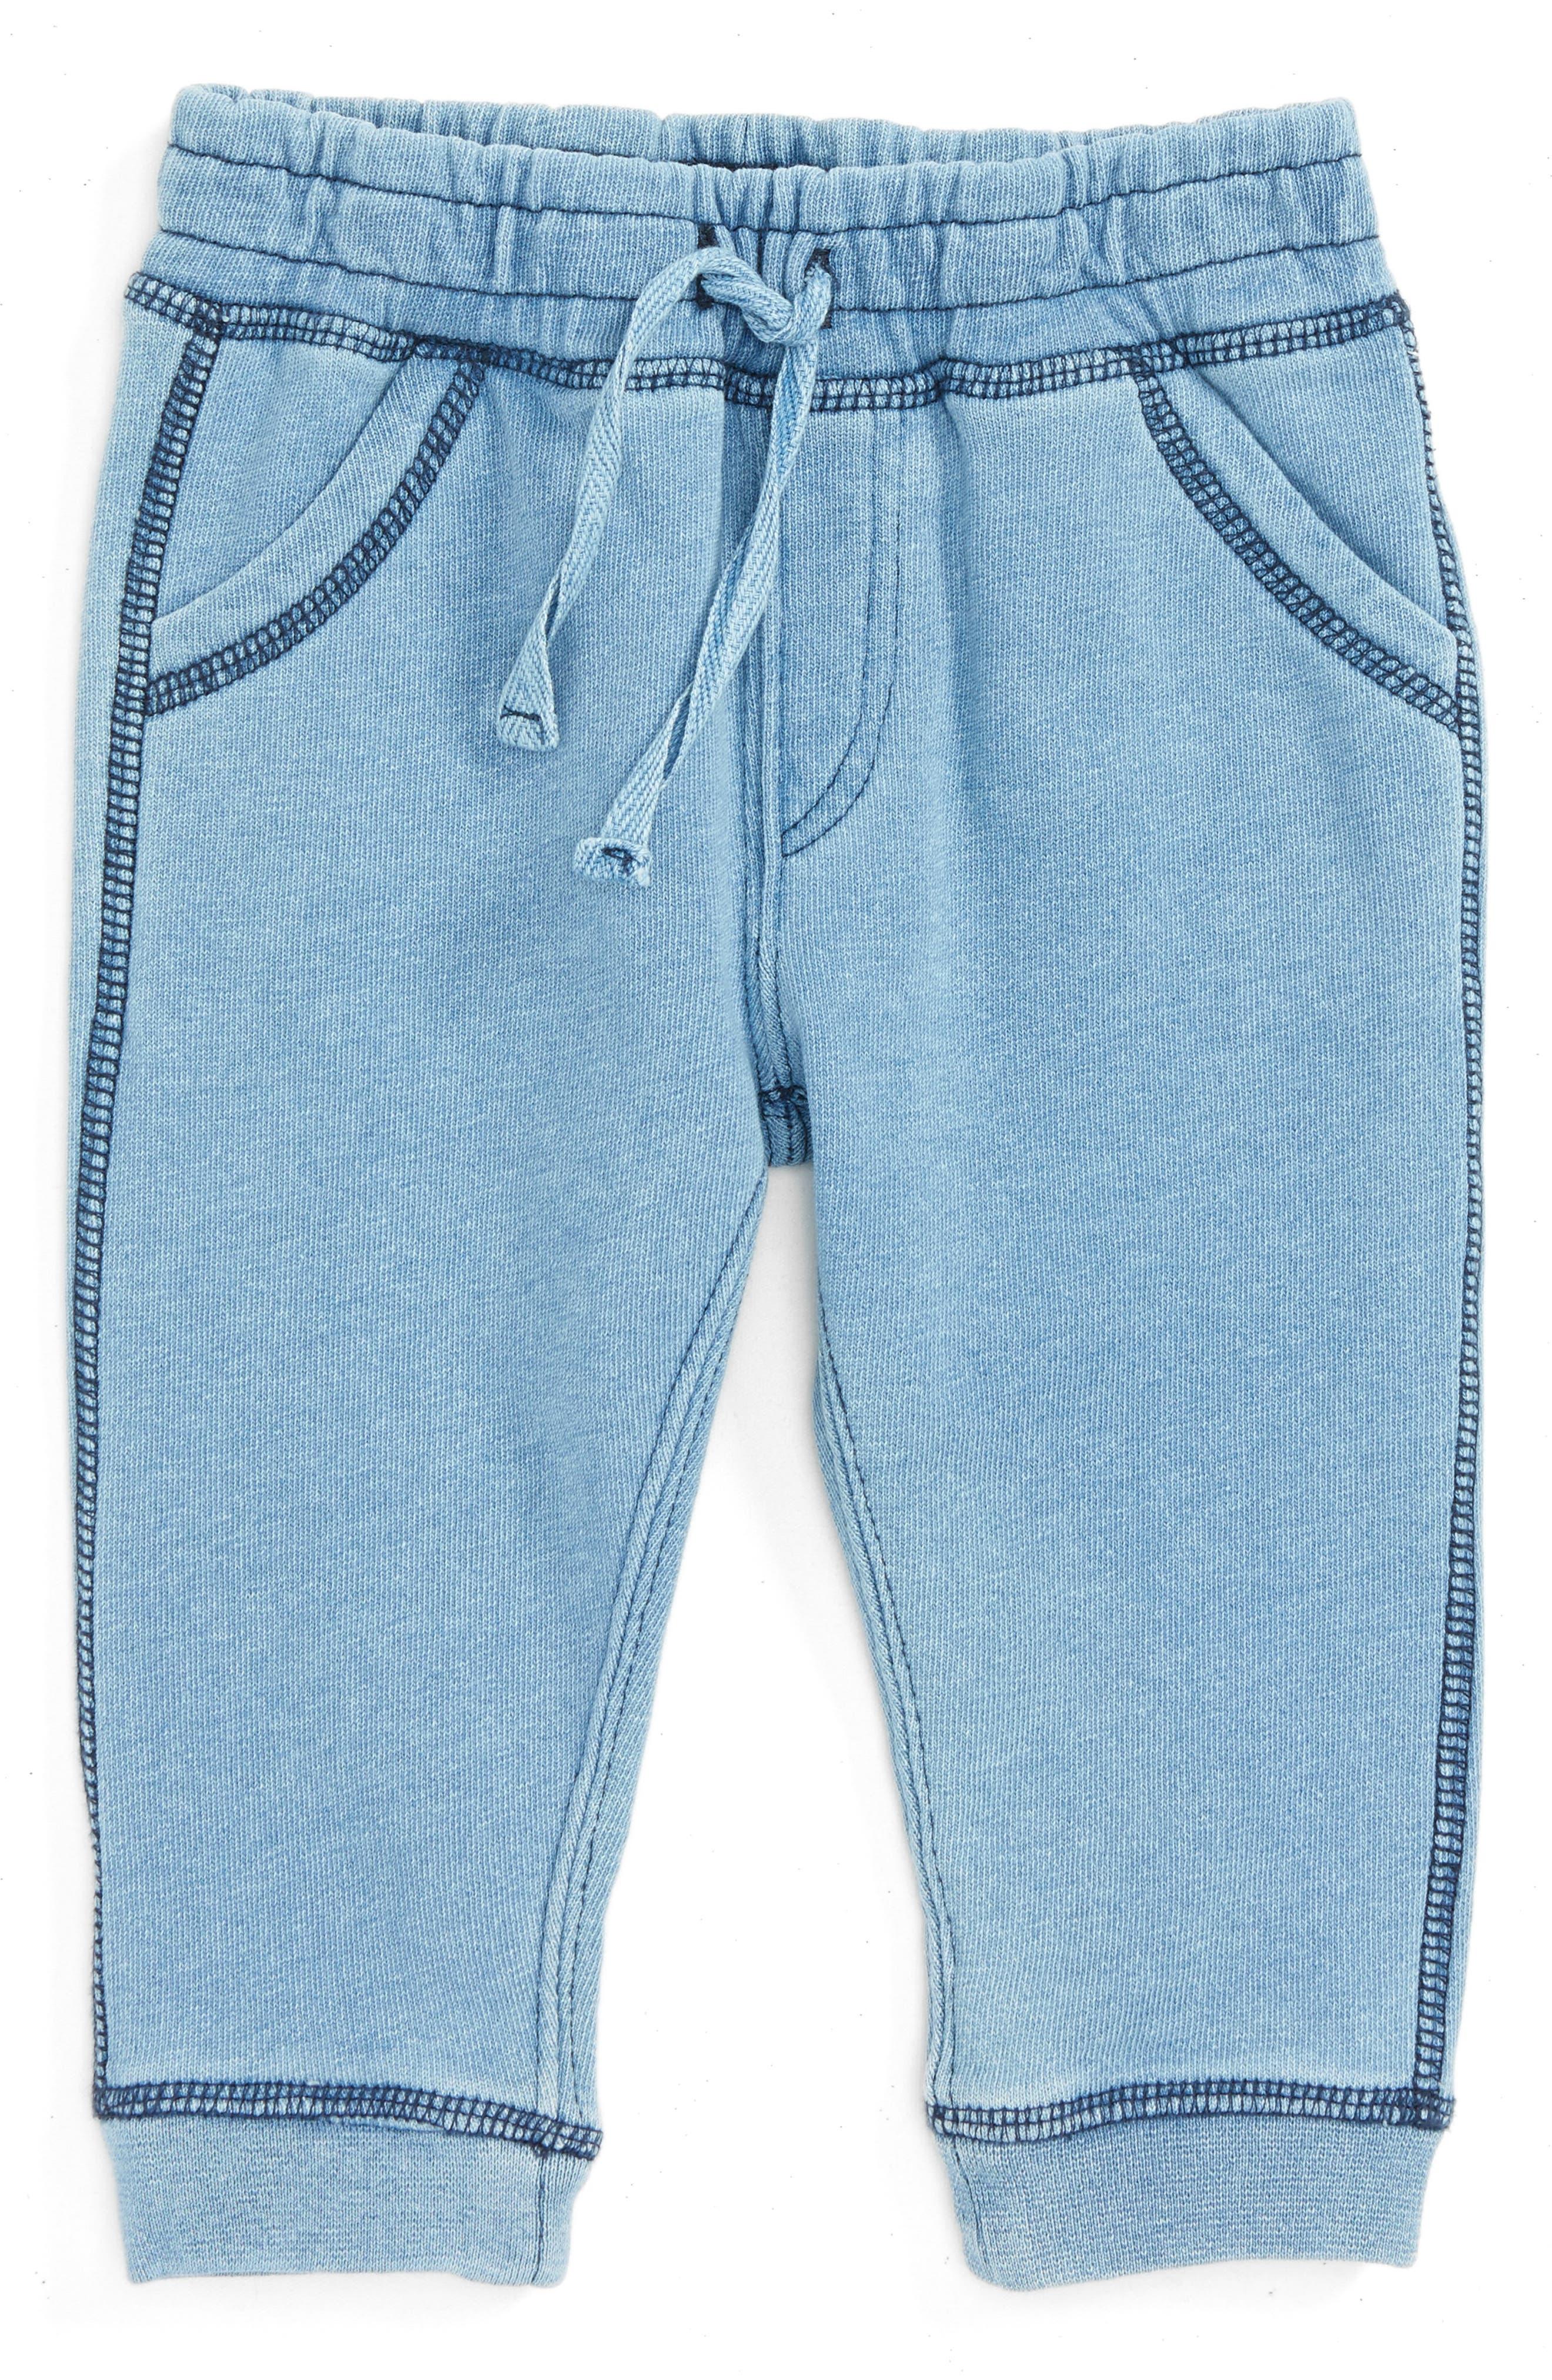 Alternate Image 1 Selected - Tucker + Tate Knit Denim Pants (Baby)